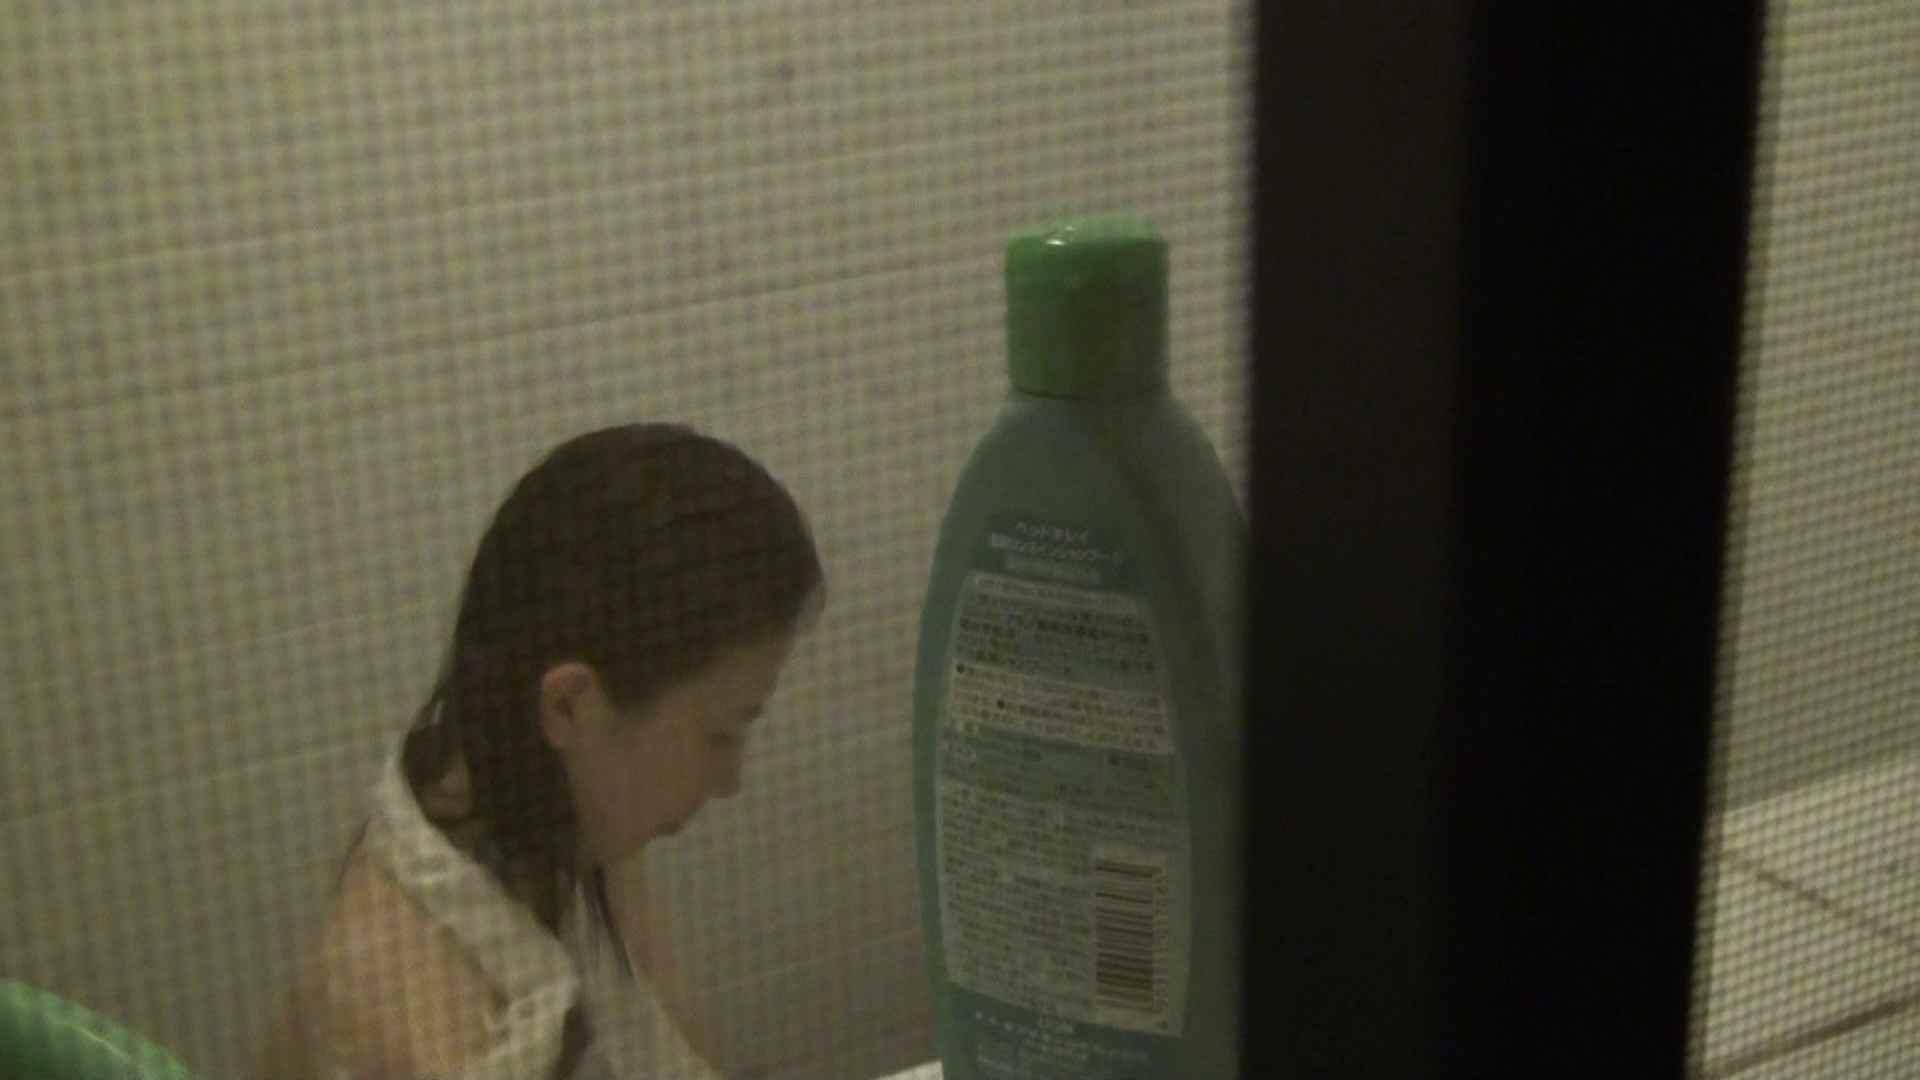 vol.06顔を洗い流す極上お女市さんの裸体をハイビジョンで!風呂上り着替え必見! 民家 オメコ動画キャプチャ 84pic 23